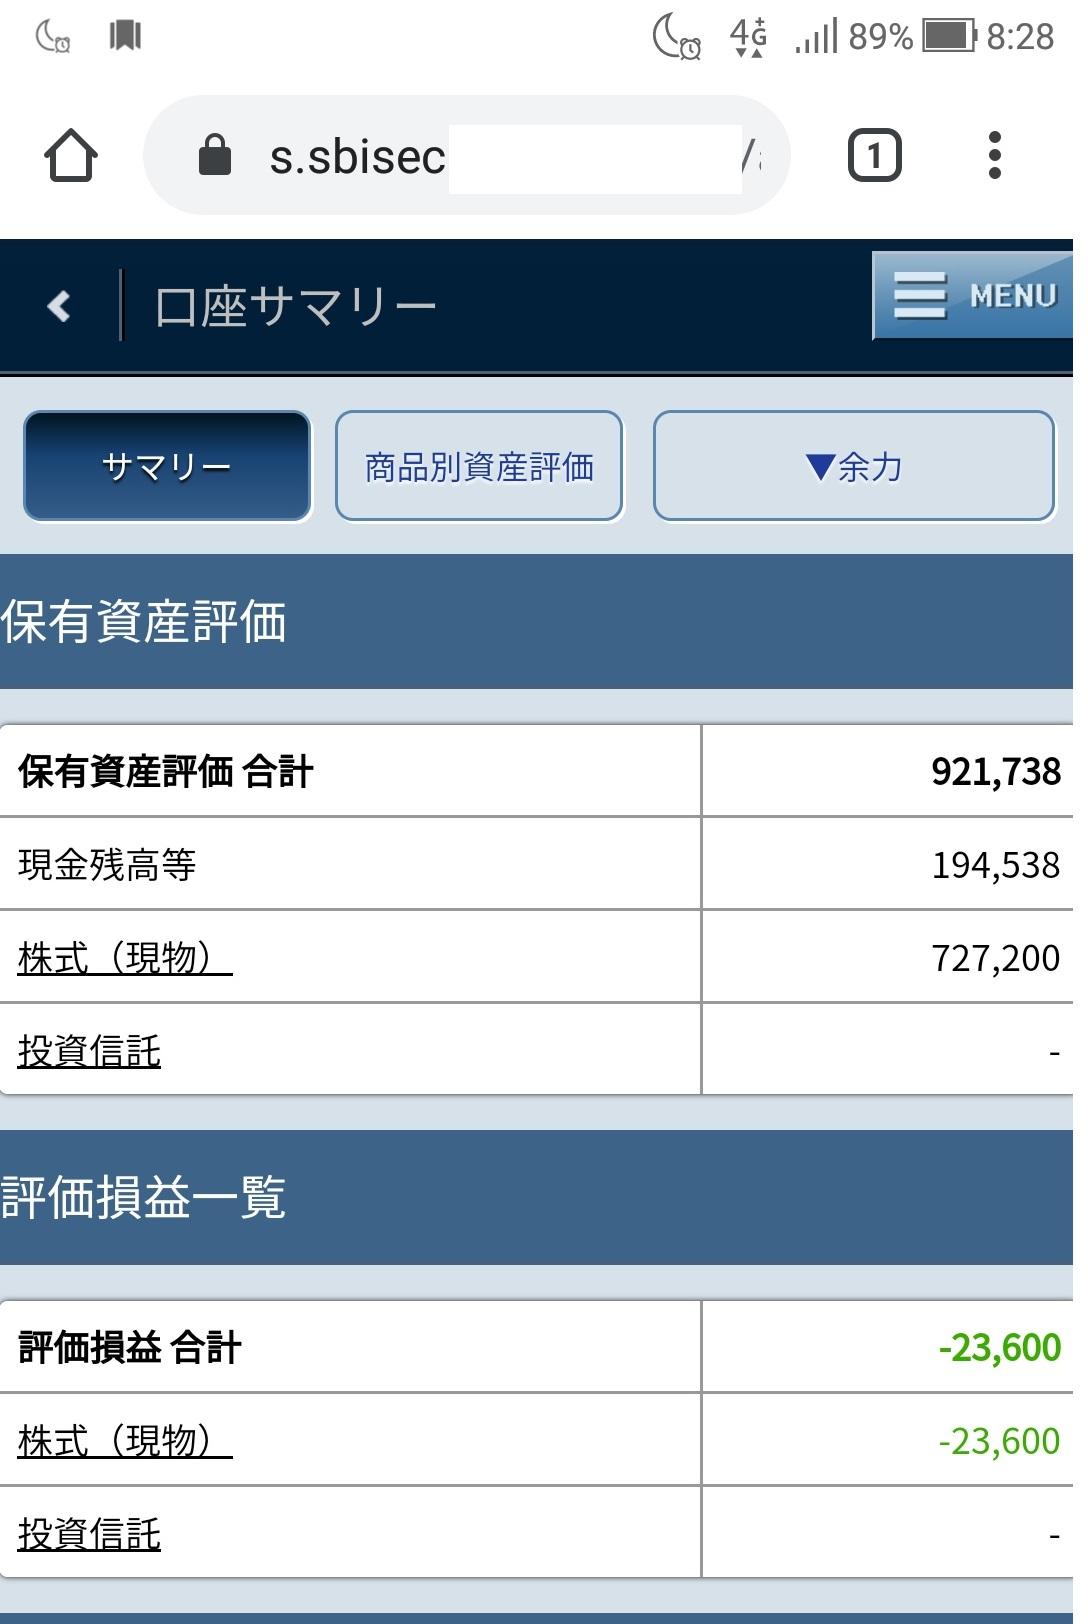 kabu_sumaho_sbi_koza20191107.jpg